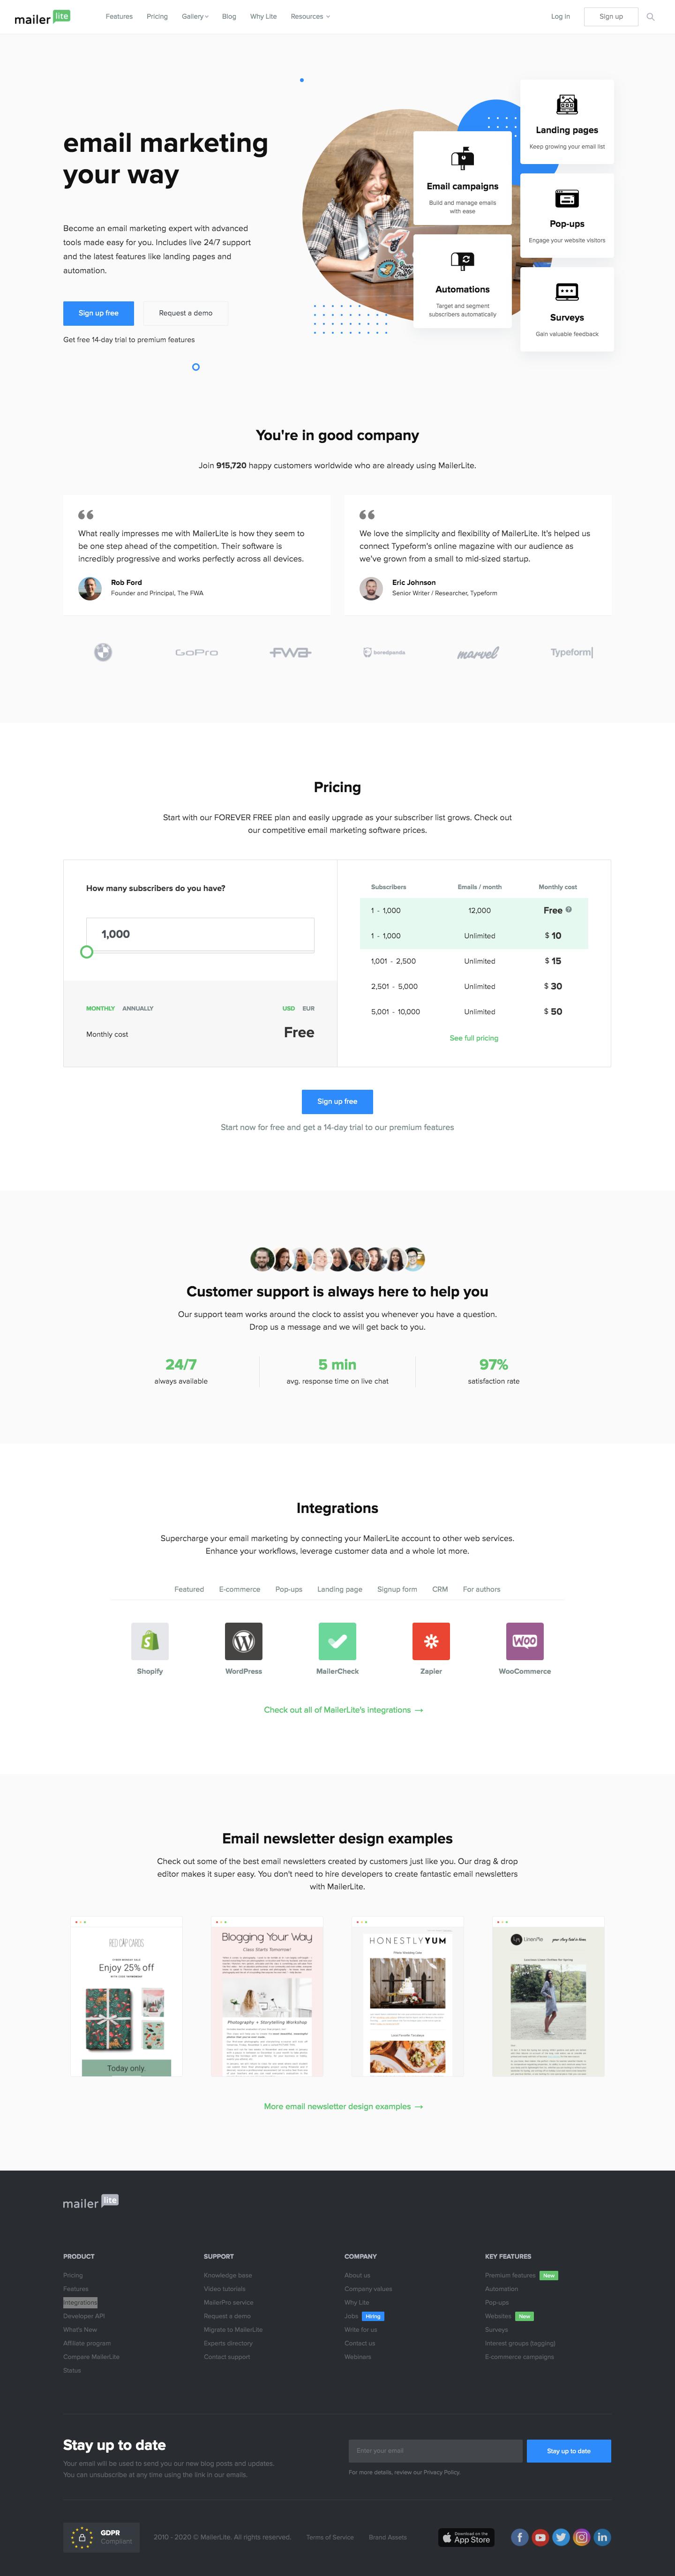 MailerLite Landing Page